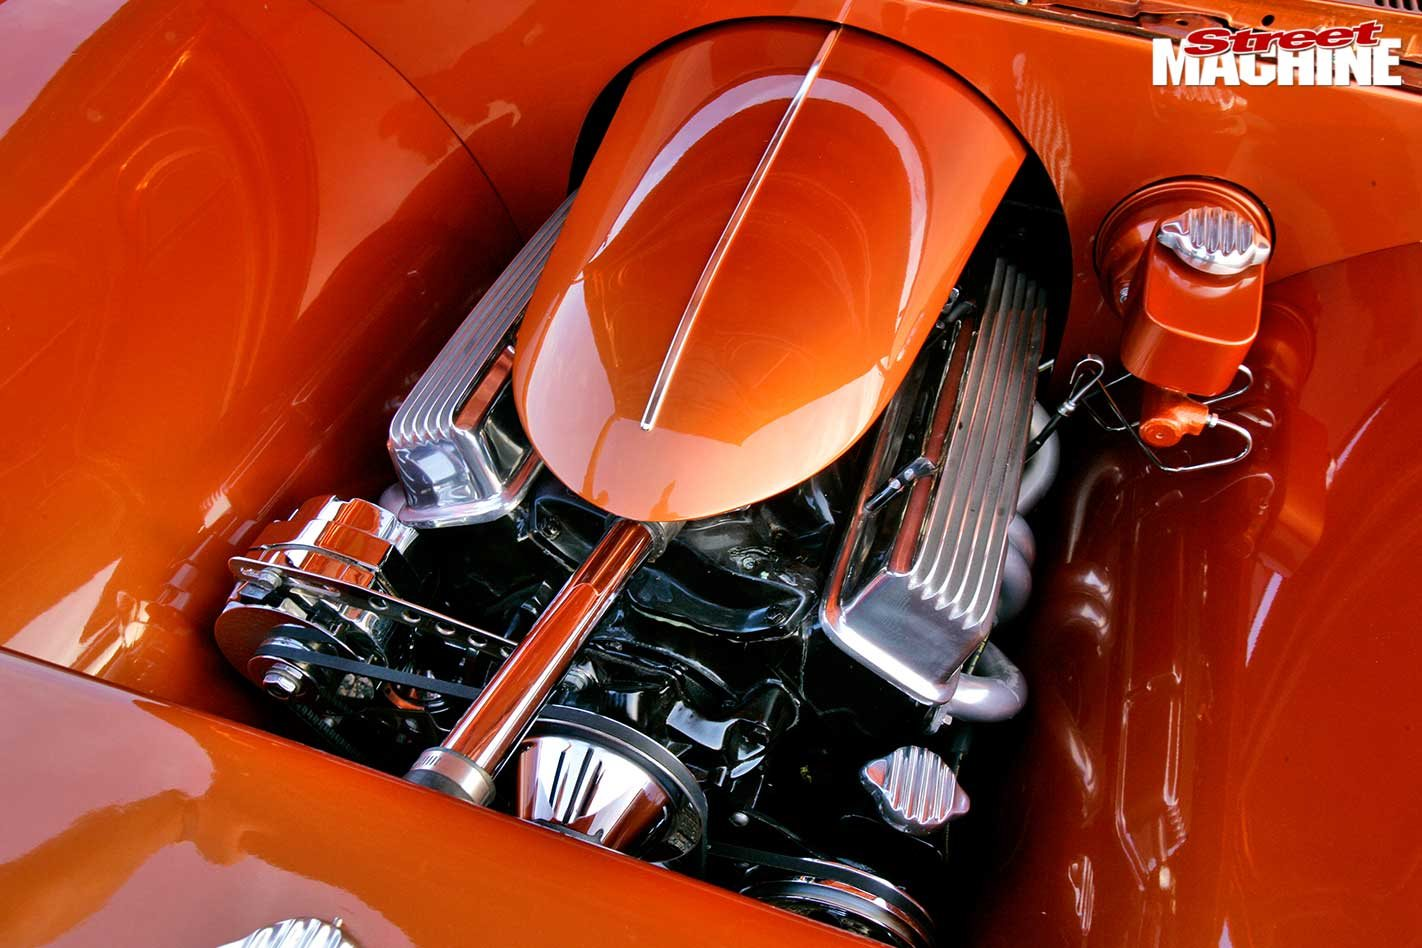 Bagged 1960 Chevrolet El Camino - flashback